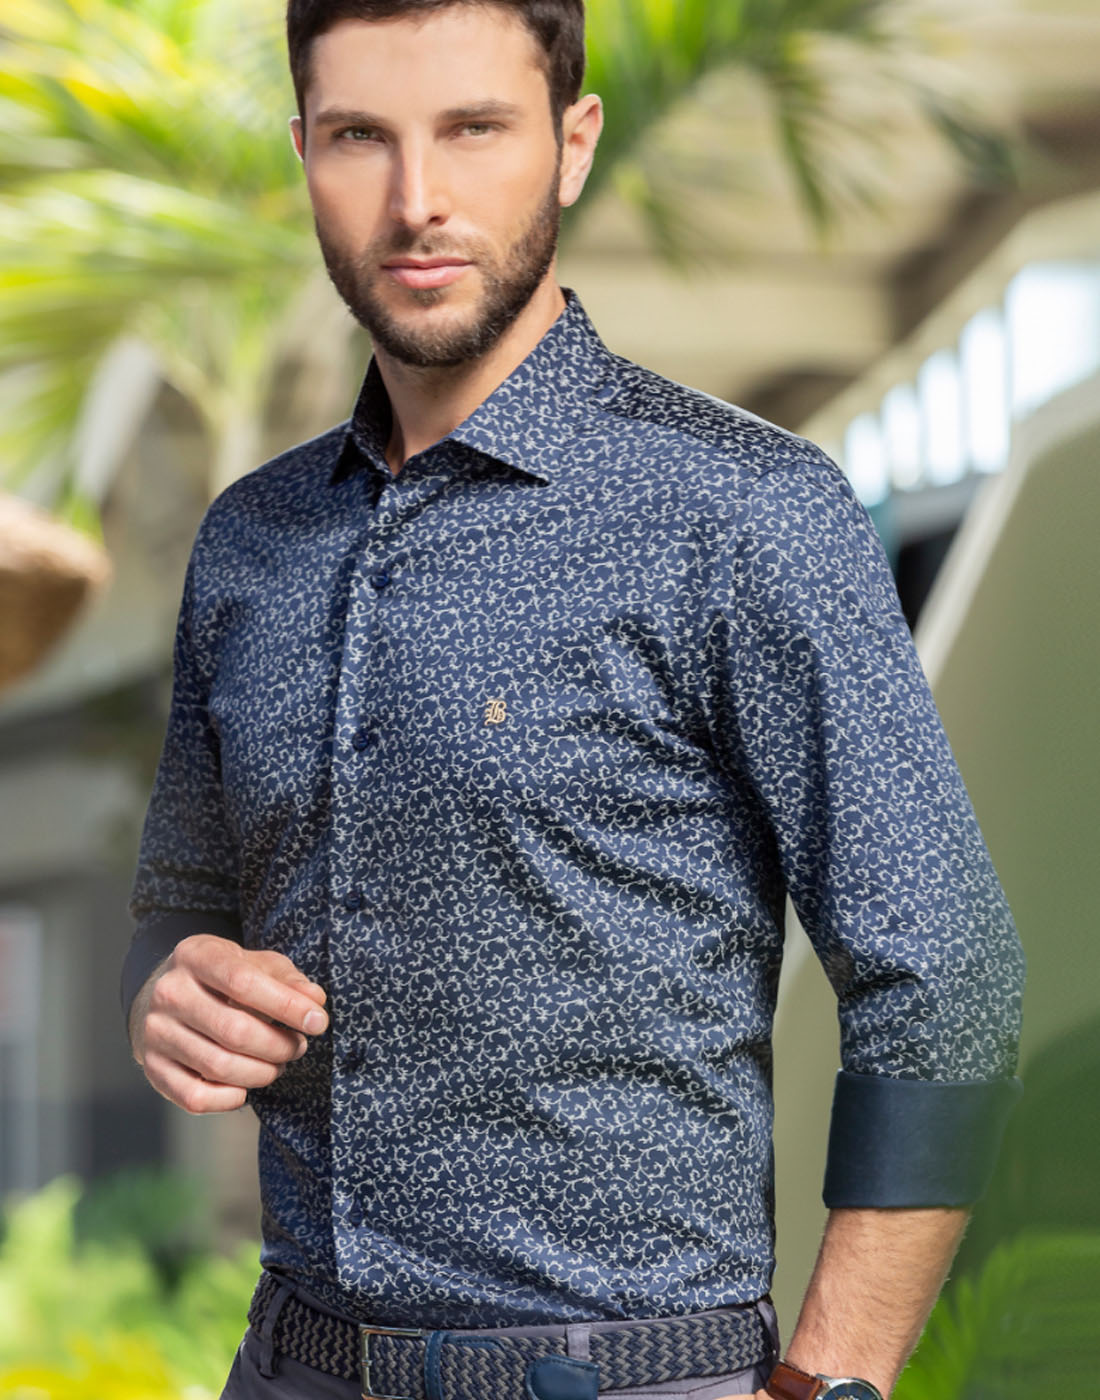 Camisa Manga Longa Estampada Marinho - Baumgarten Elegance